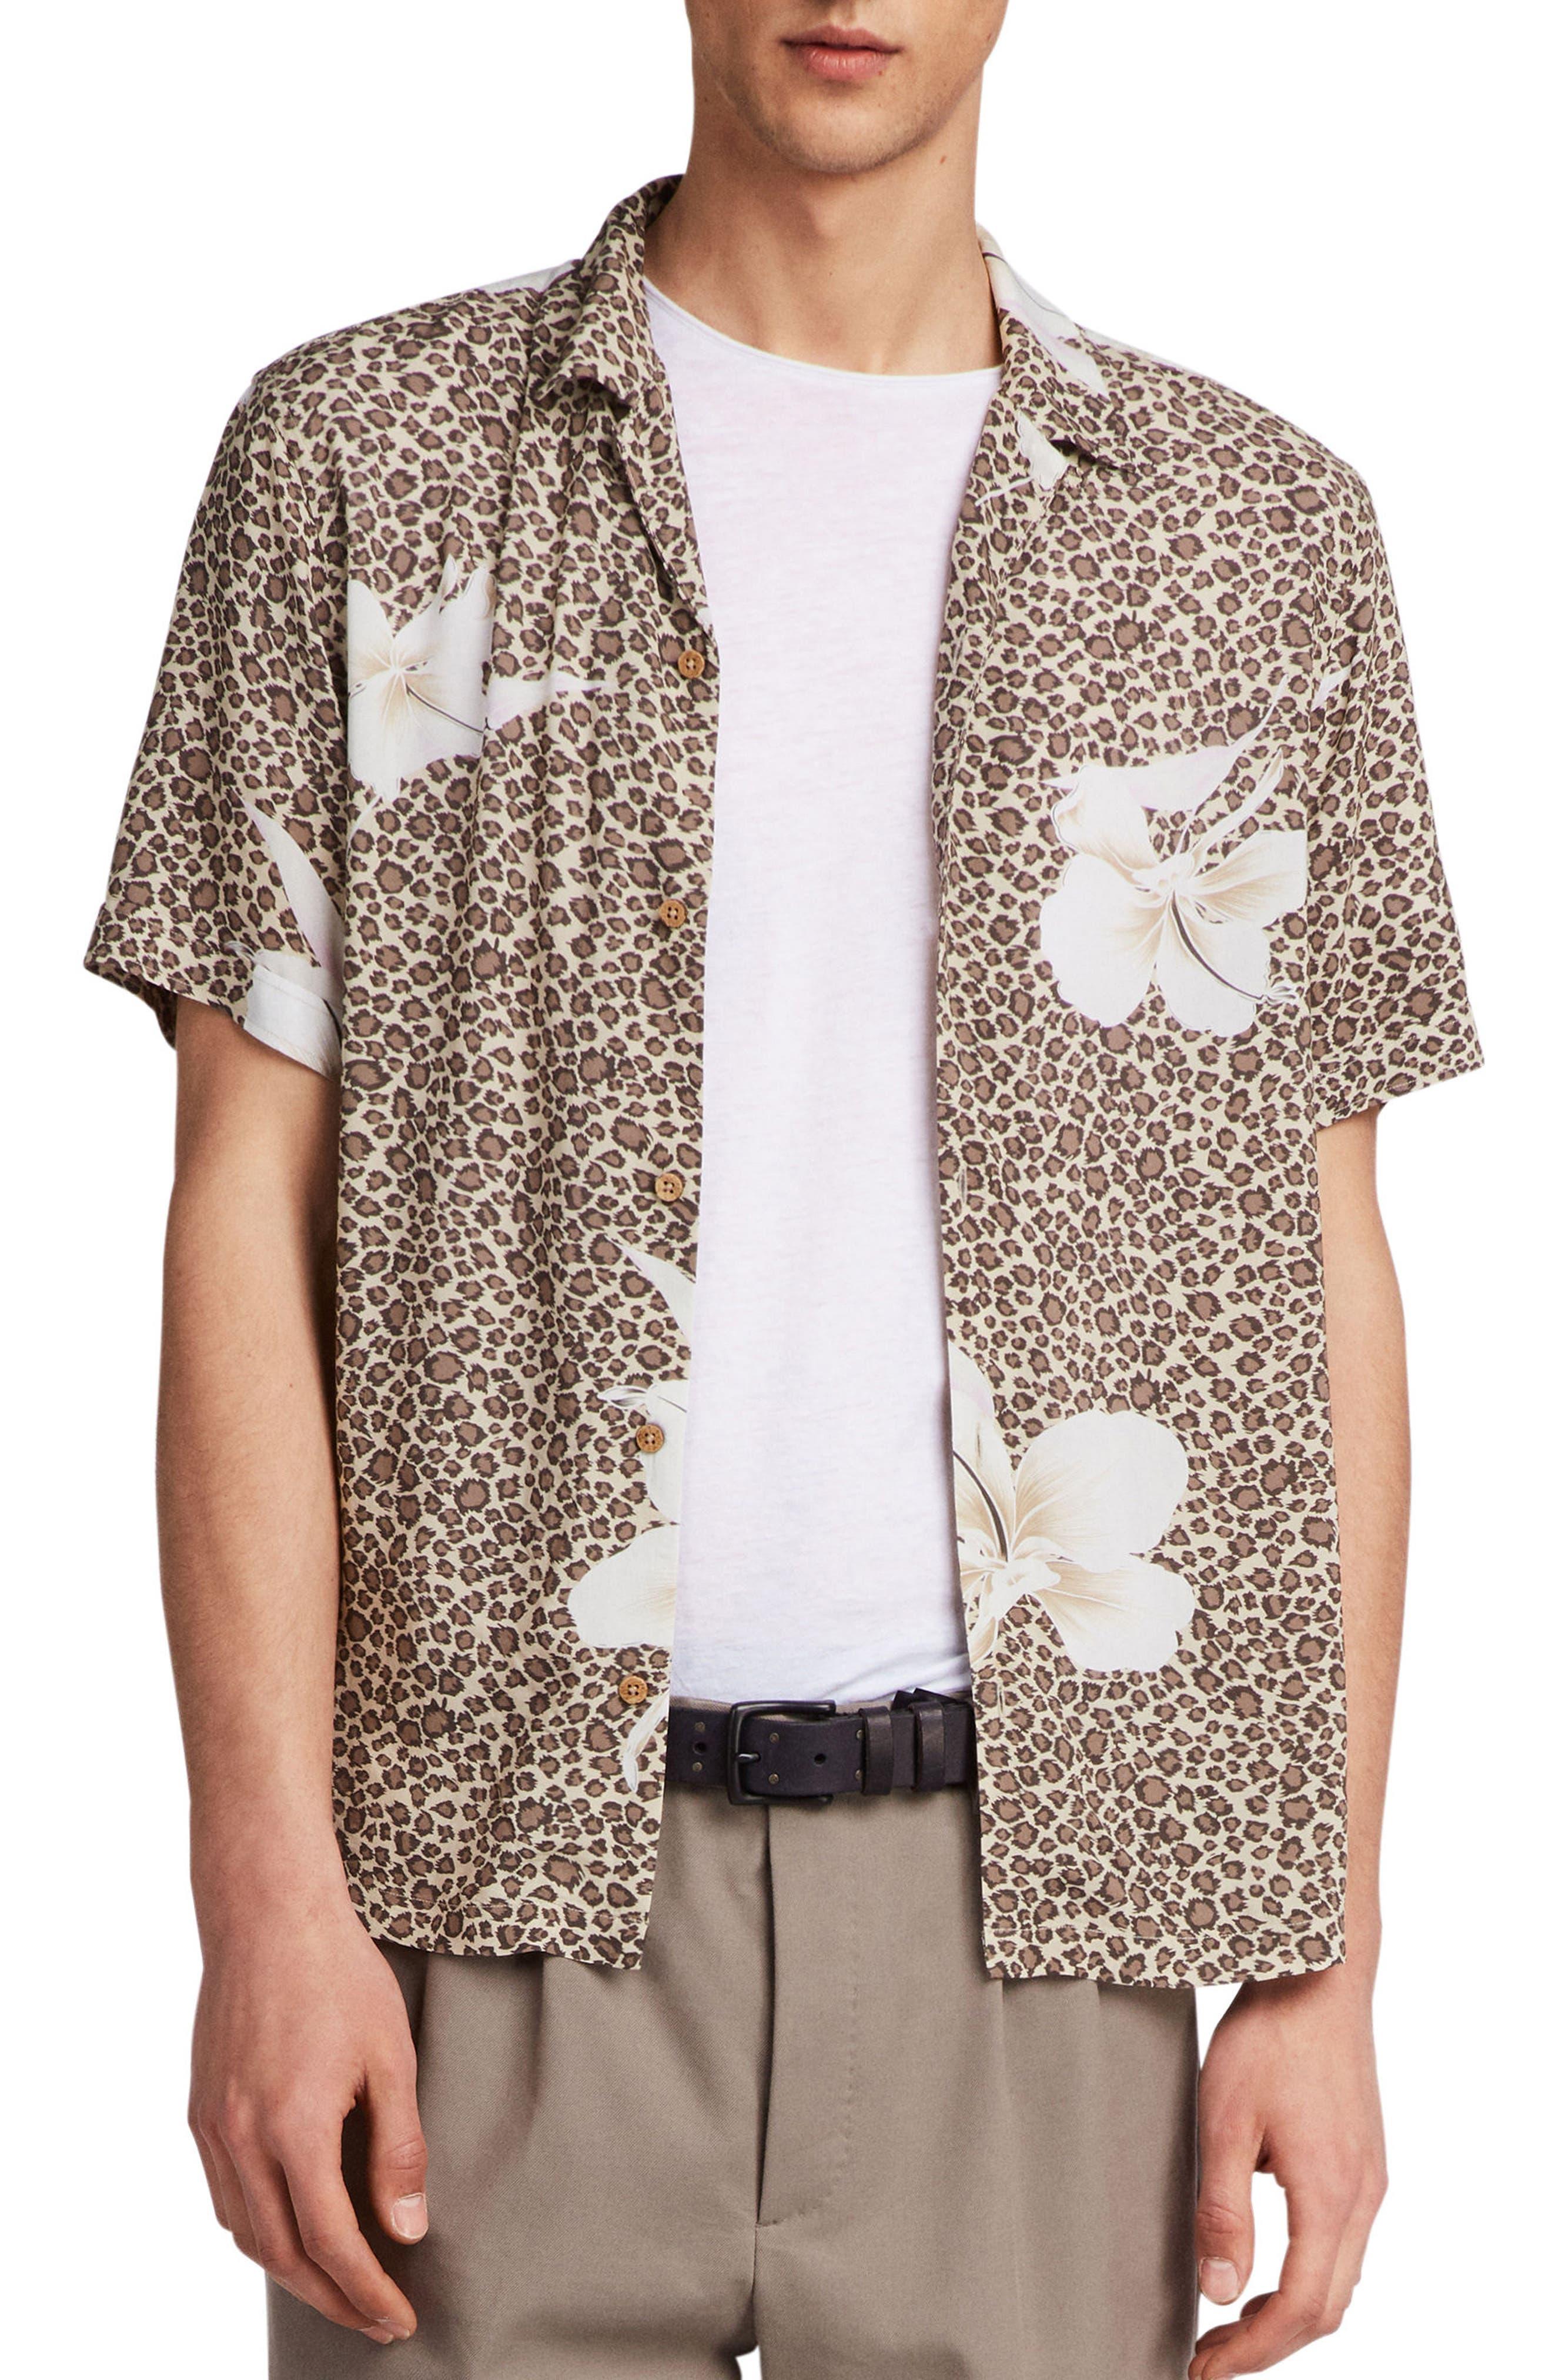 Kuhi Regular Fit Short Sleeve Sport Shirt,                             Main thumbnail 1, color,                             SAND